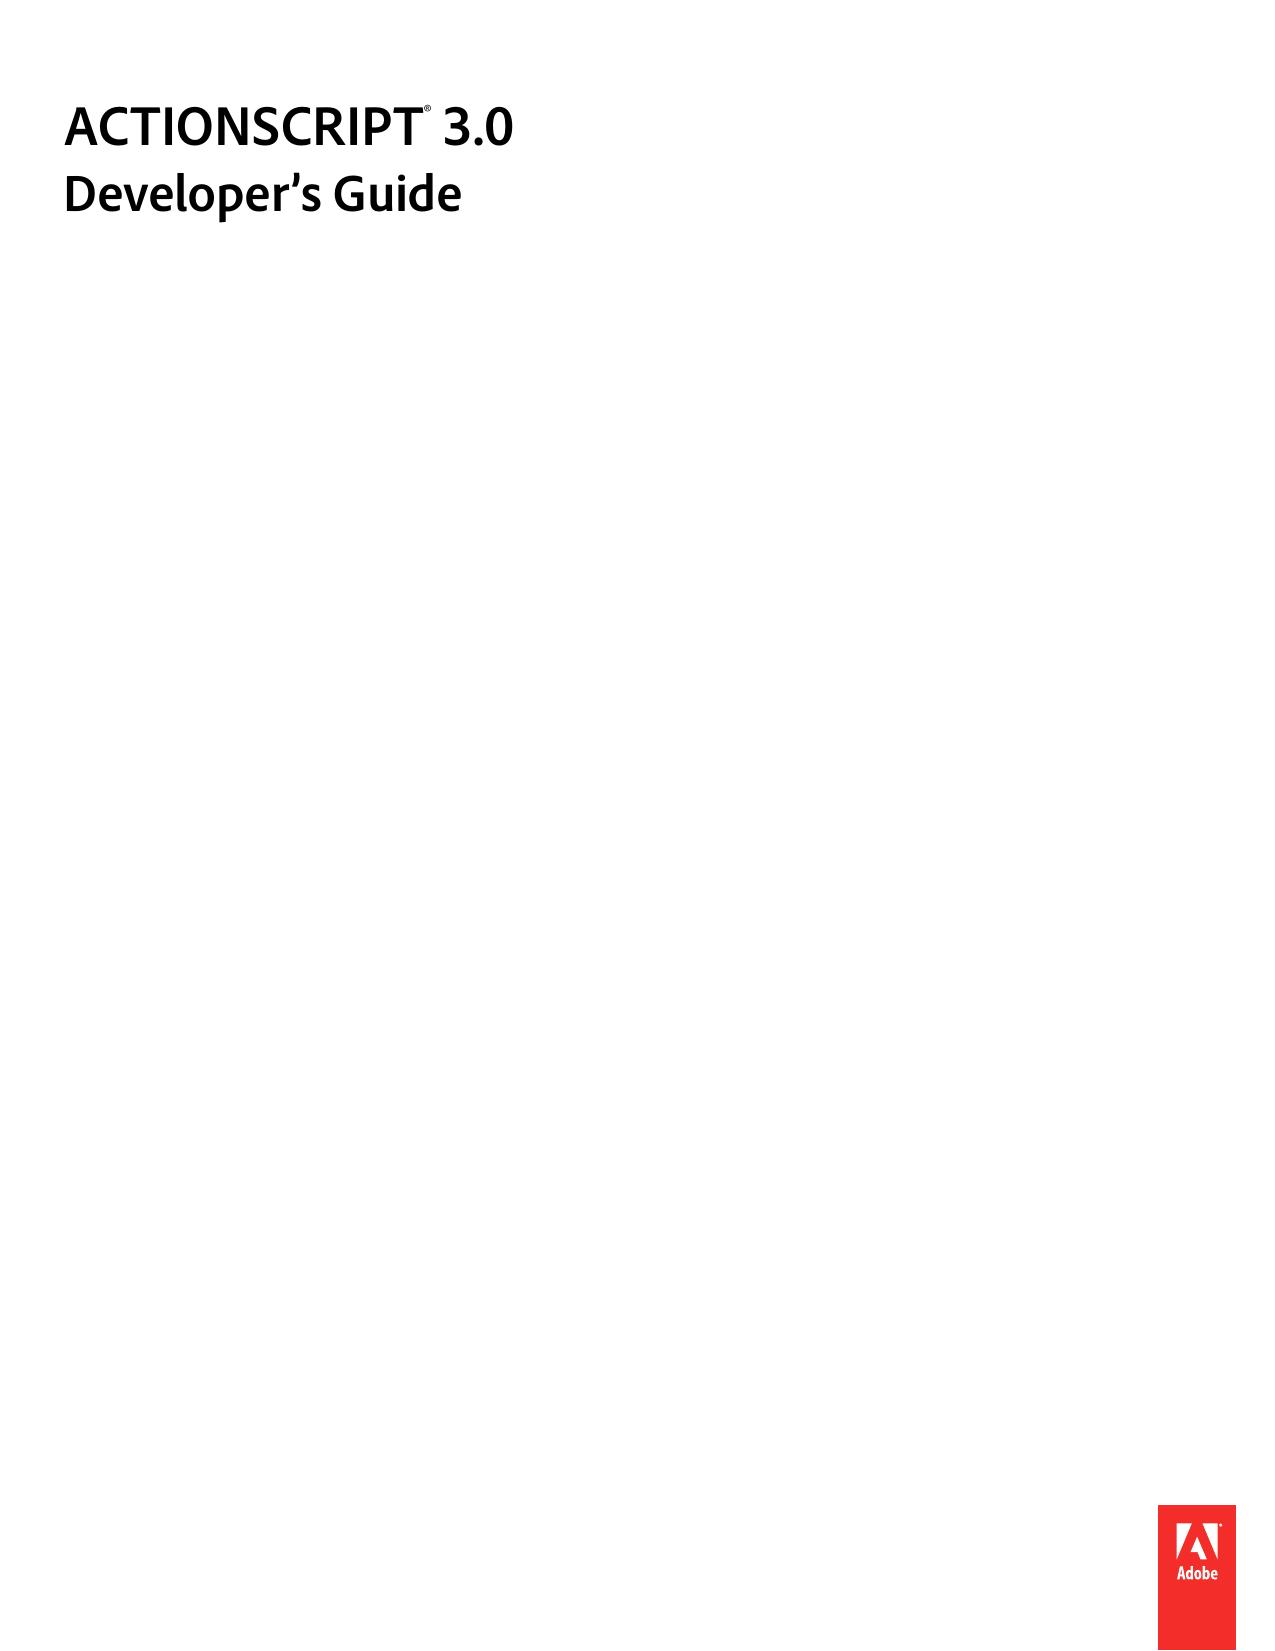 ActionScript 3.0 Developer`s Guide | manualzz.com